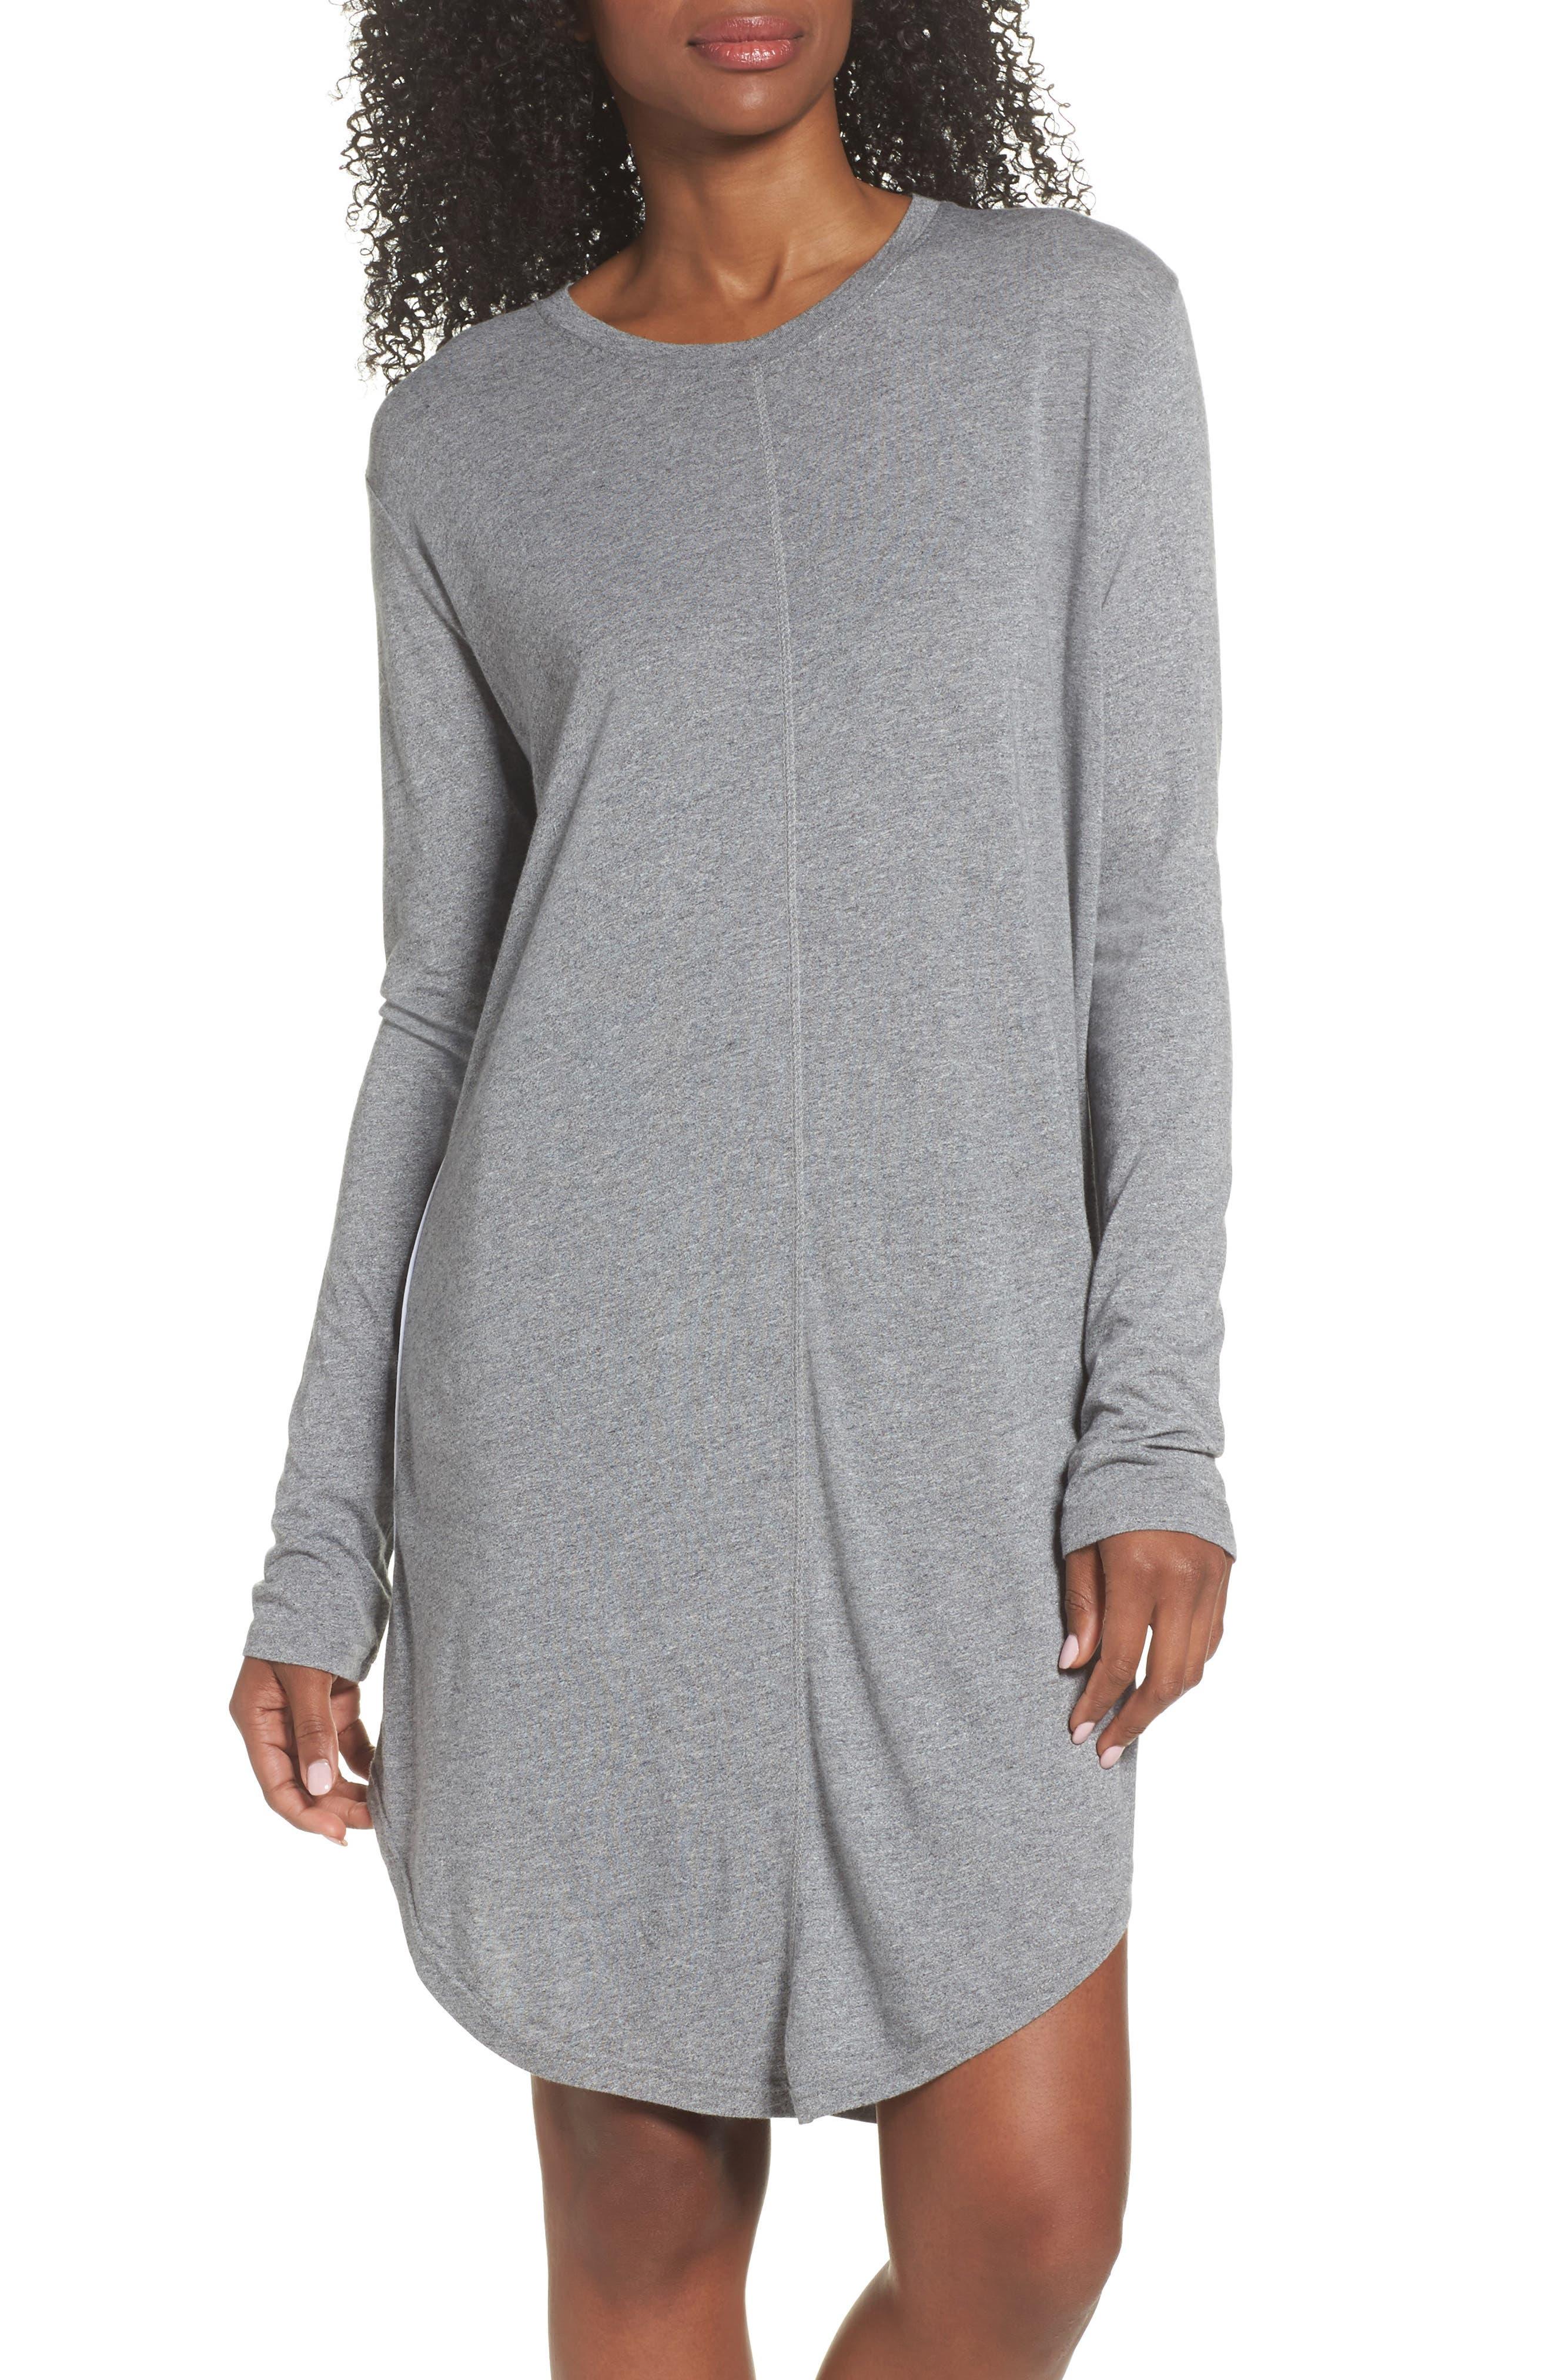 Chalmers Wednesday Sleep Shirt